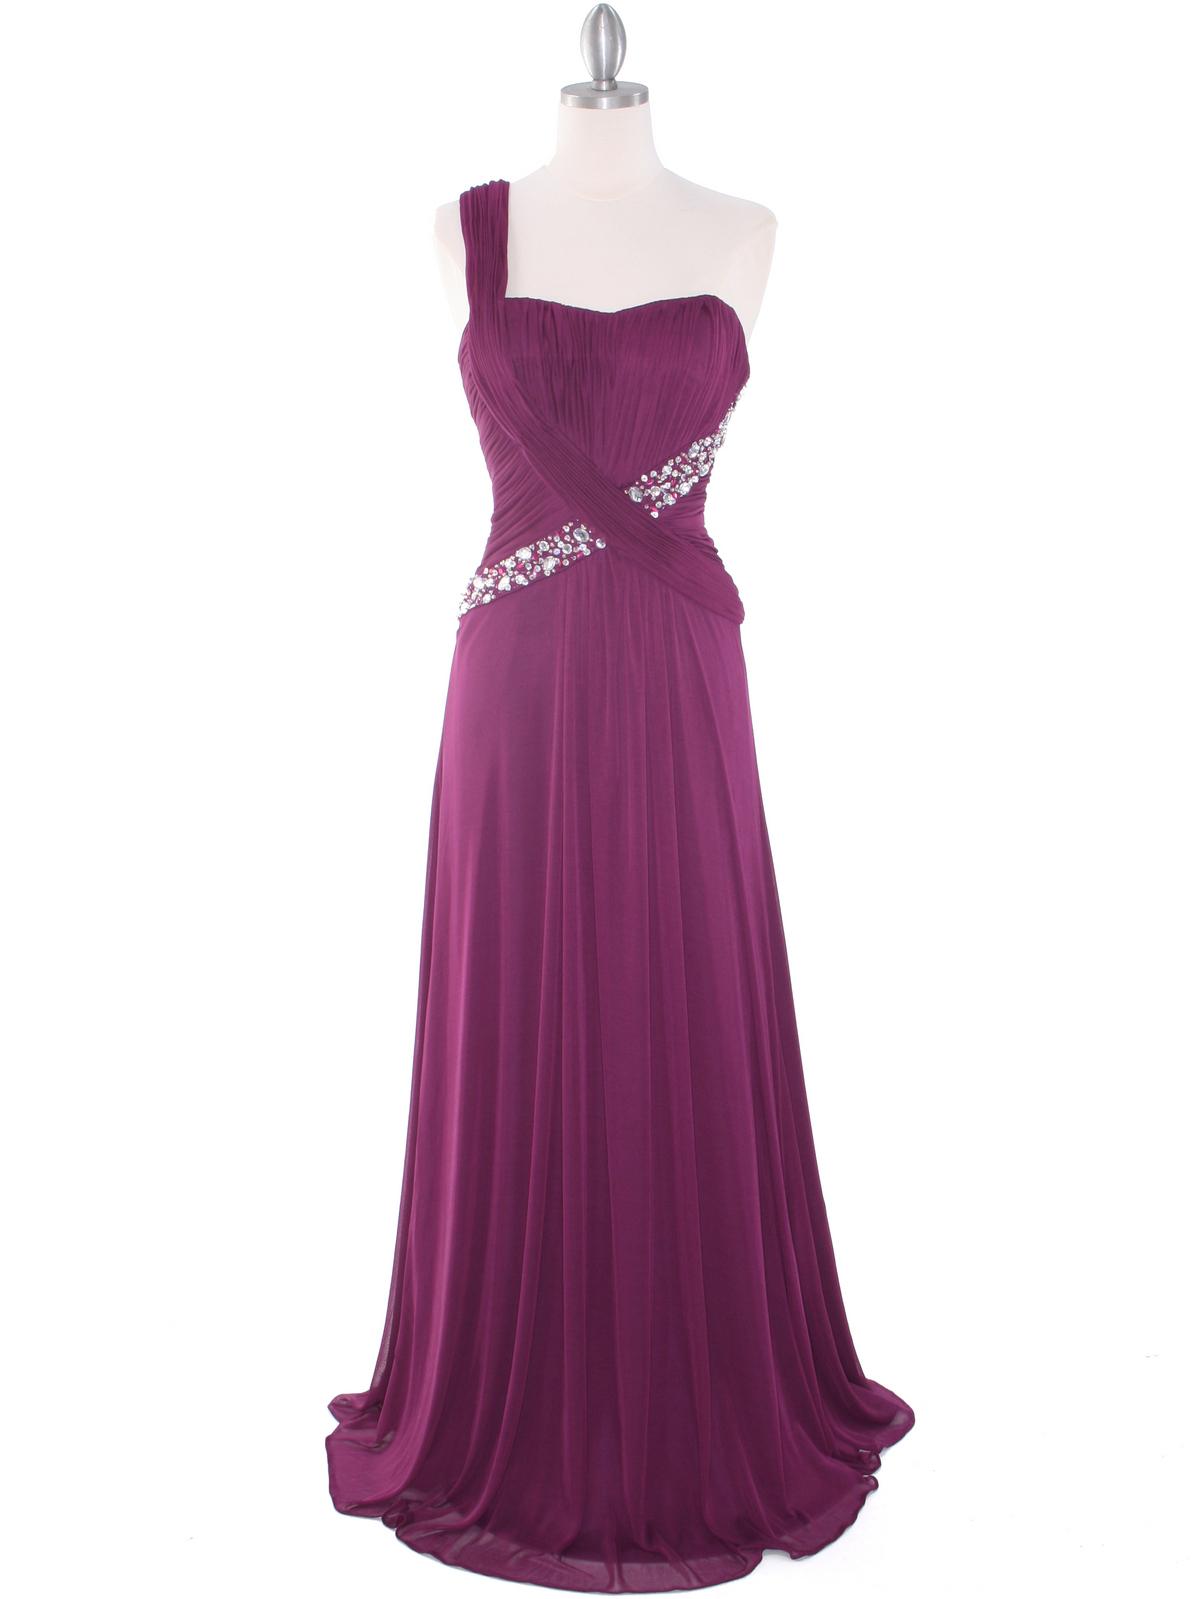 Plum One Shoulder Pleated Evening Dress Sung Boutique L A